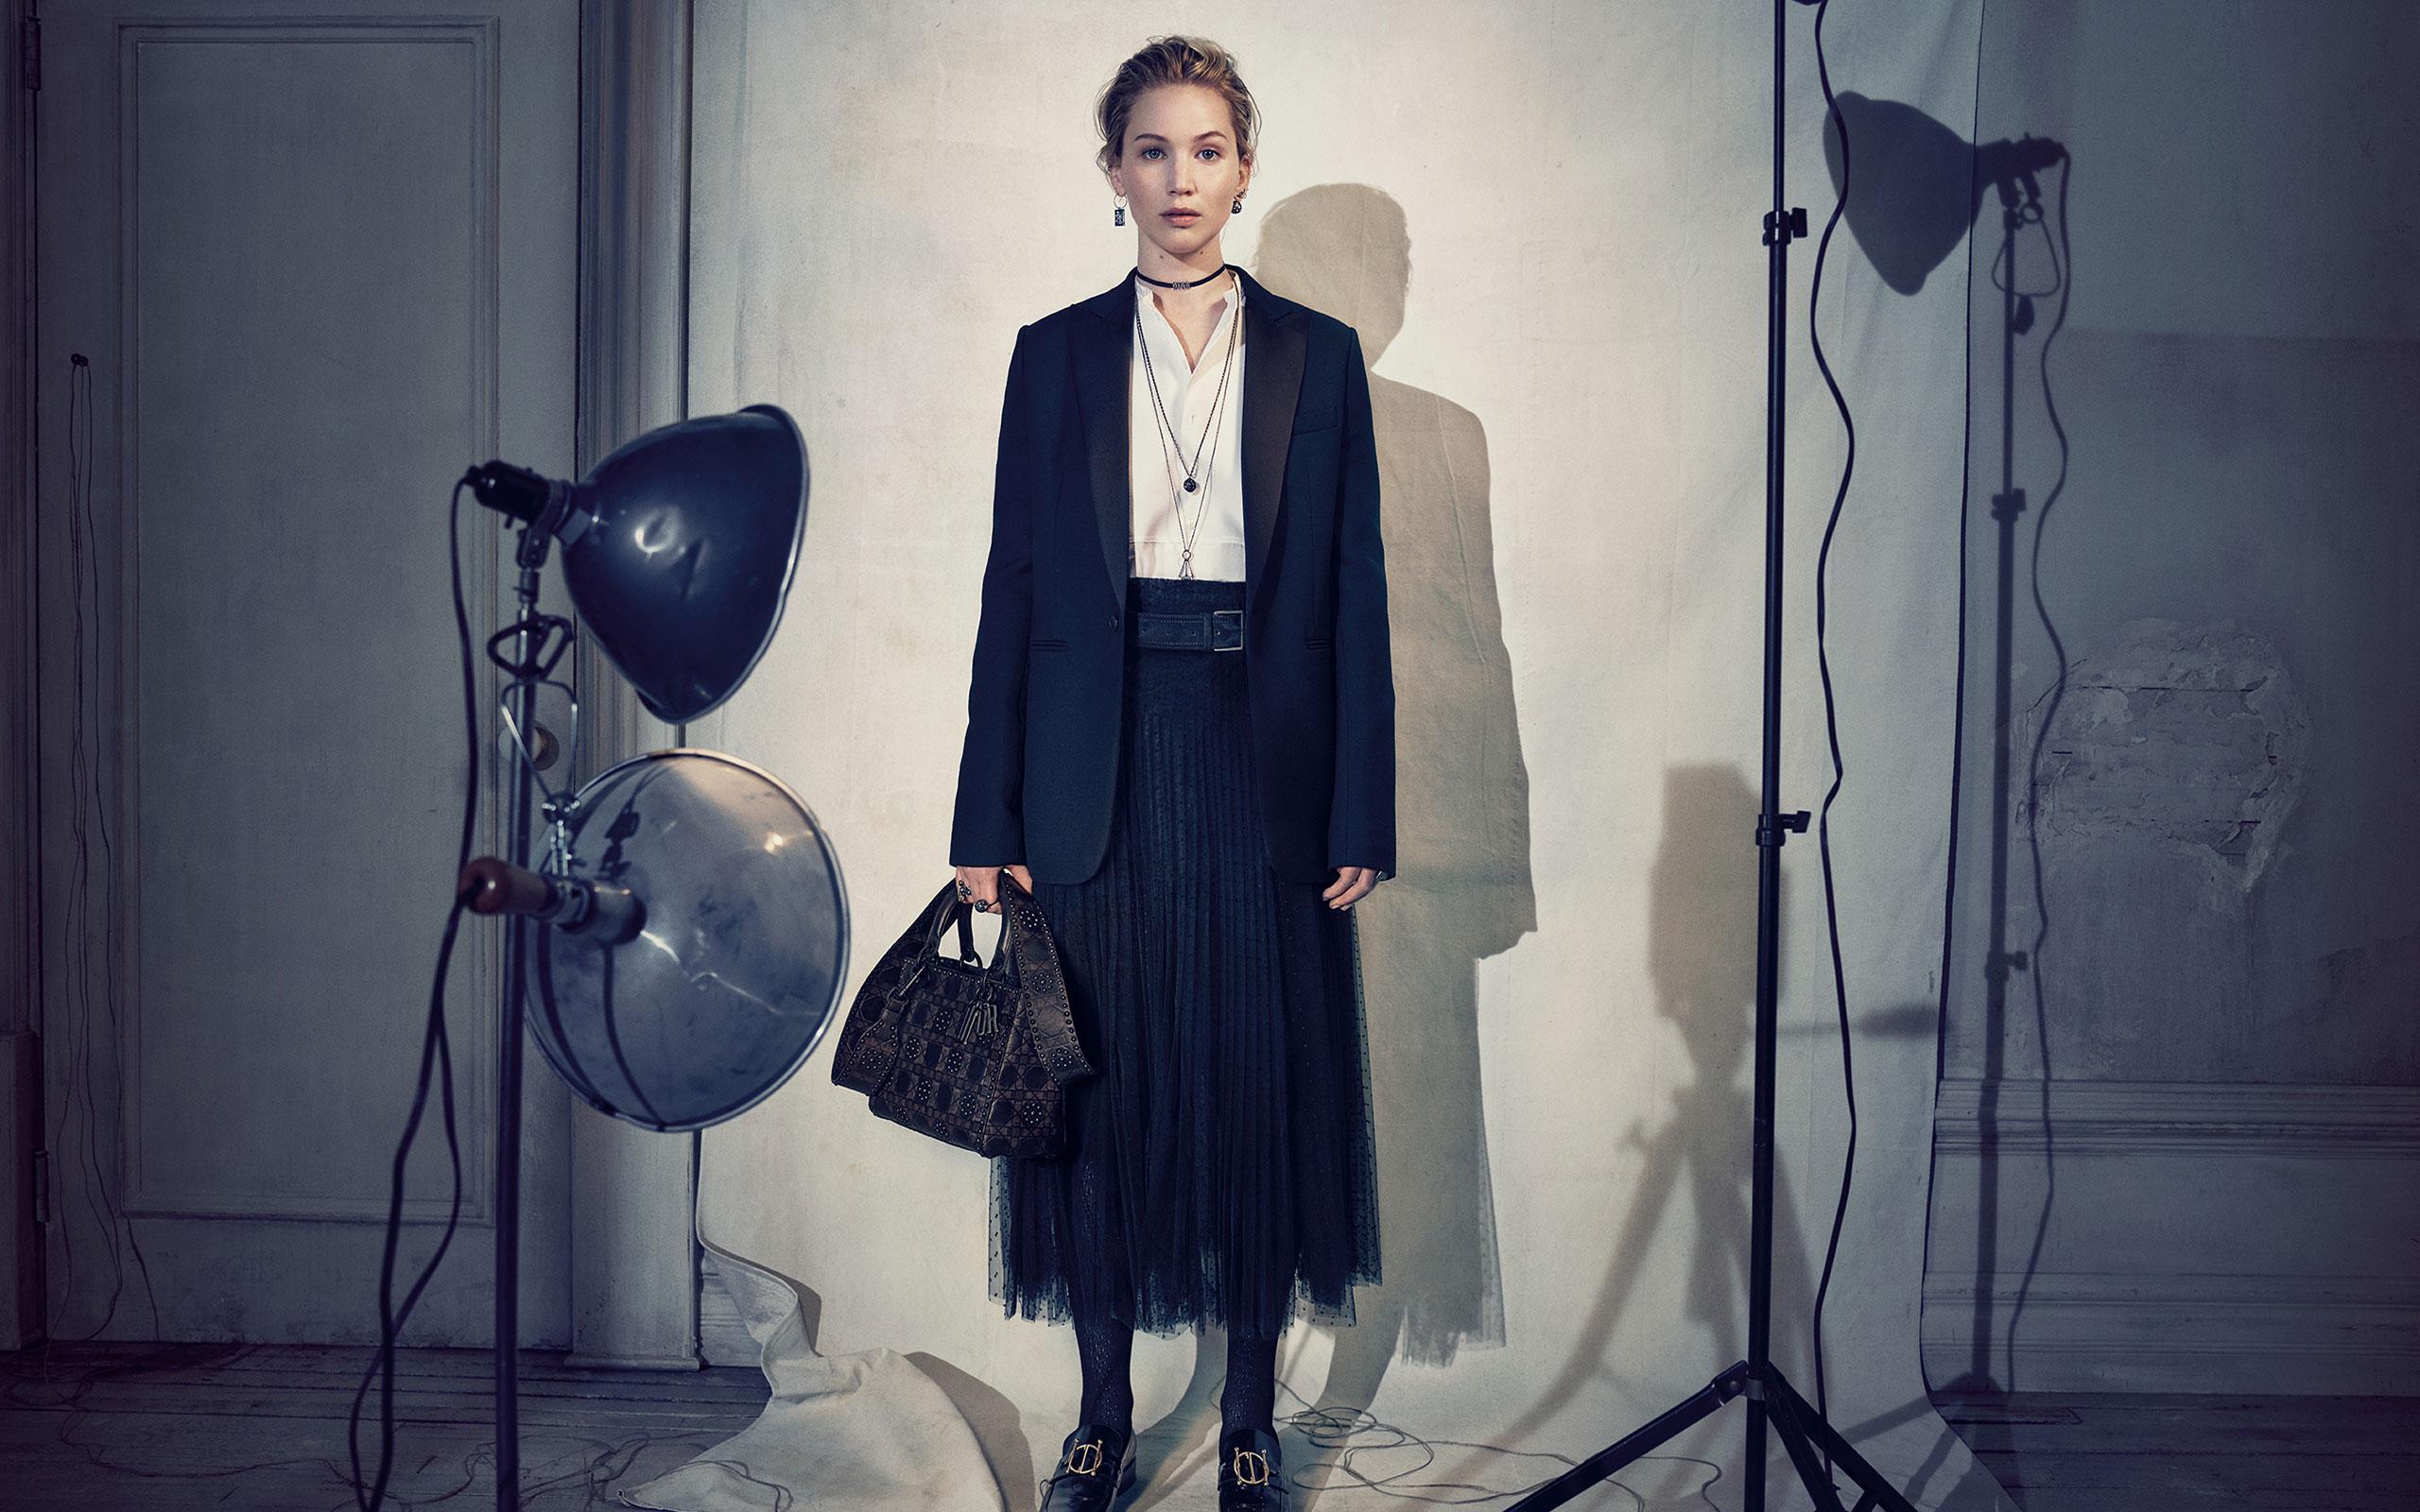 Brigitte Lacombe Shots Jennifer Lawrence For Dior's Latest Campaign